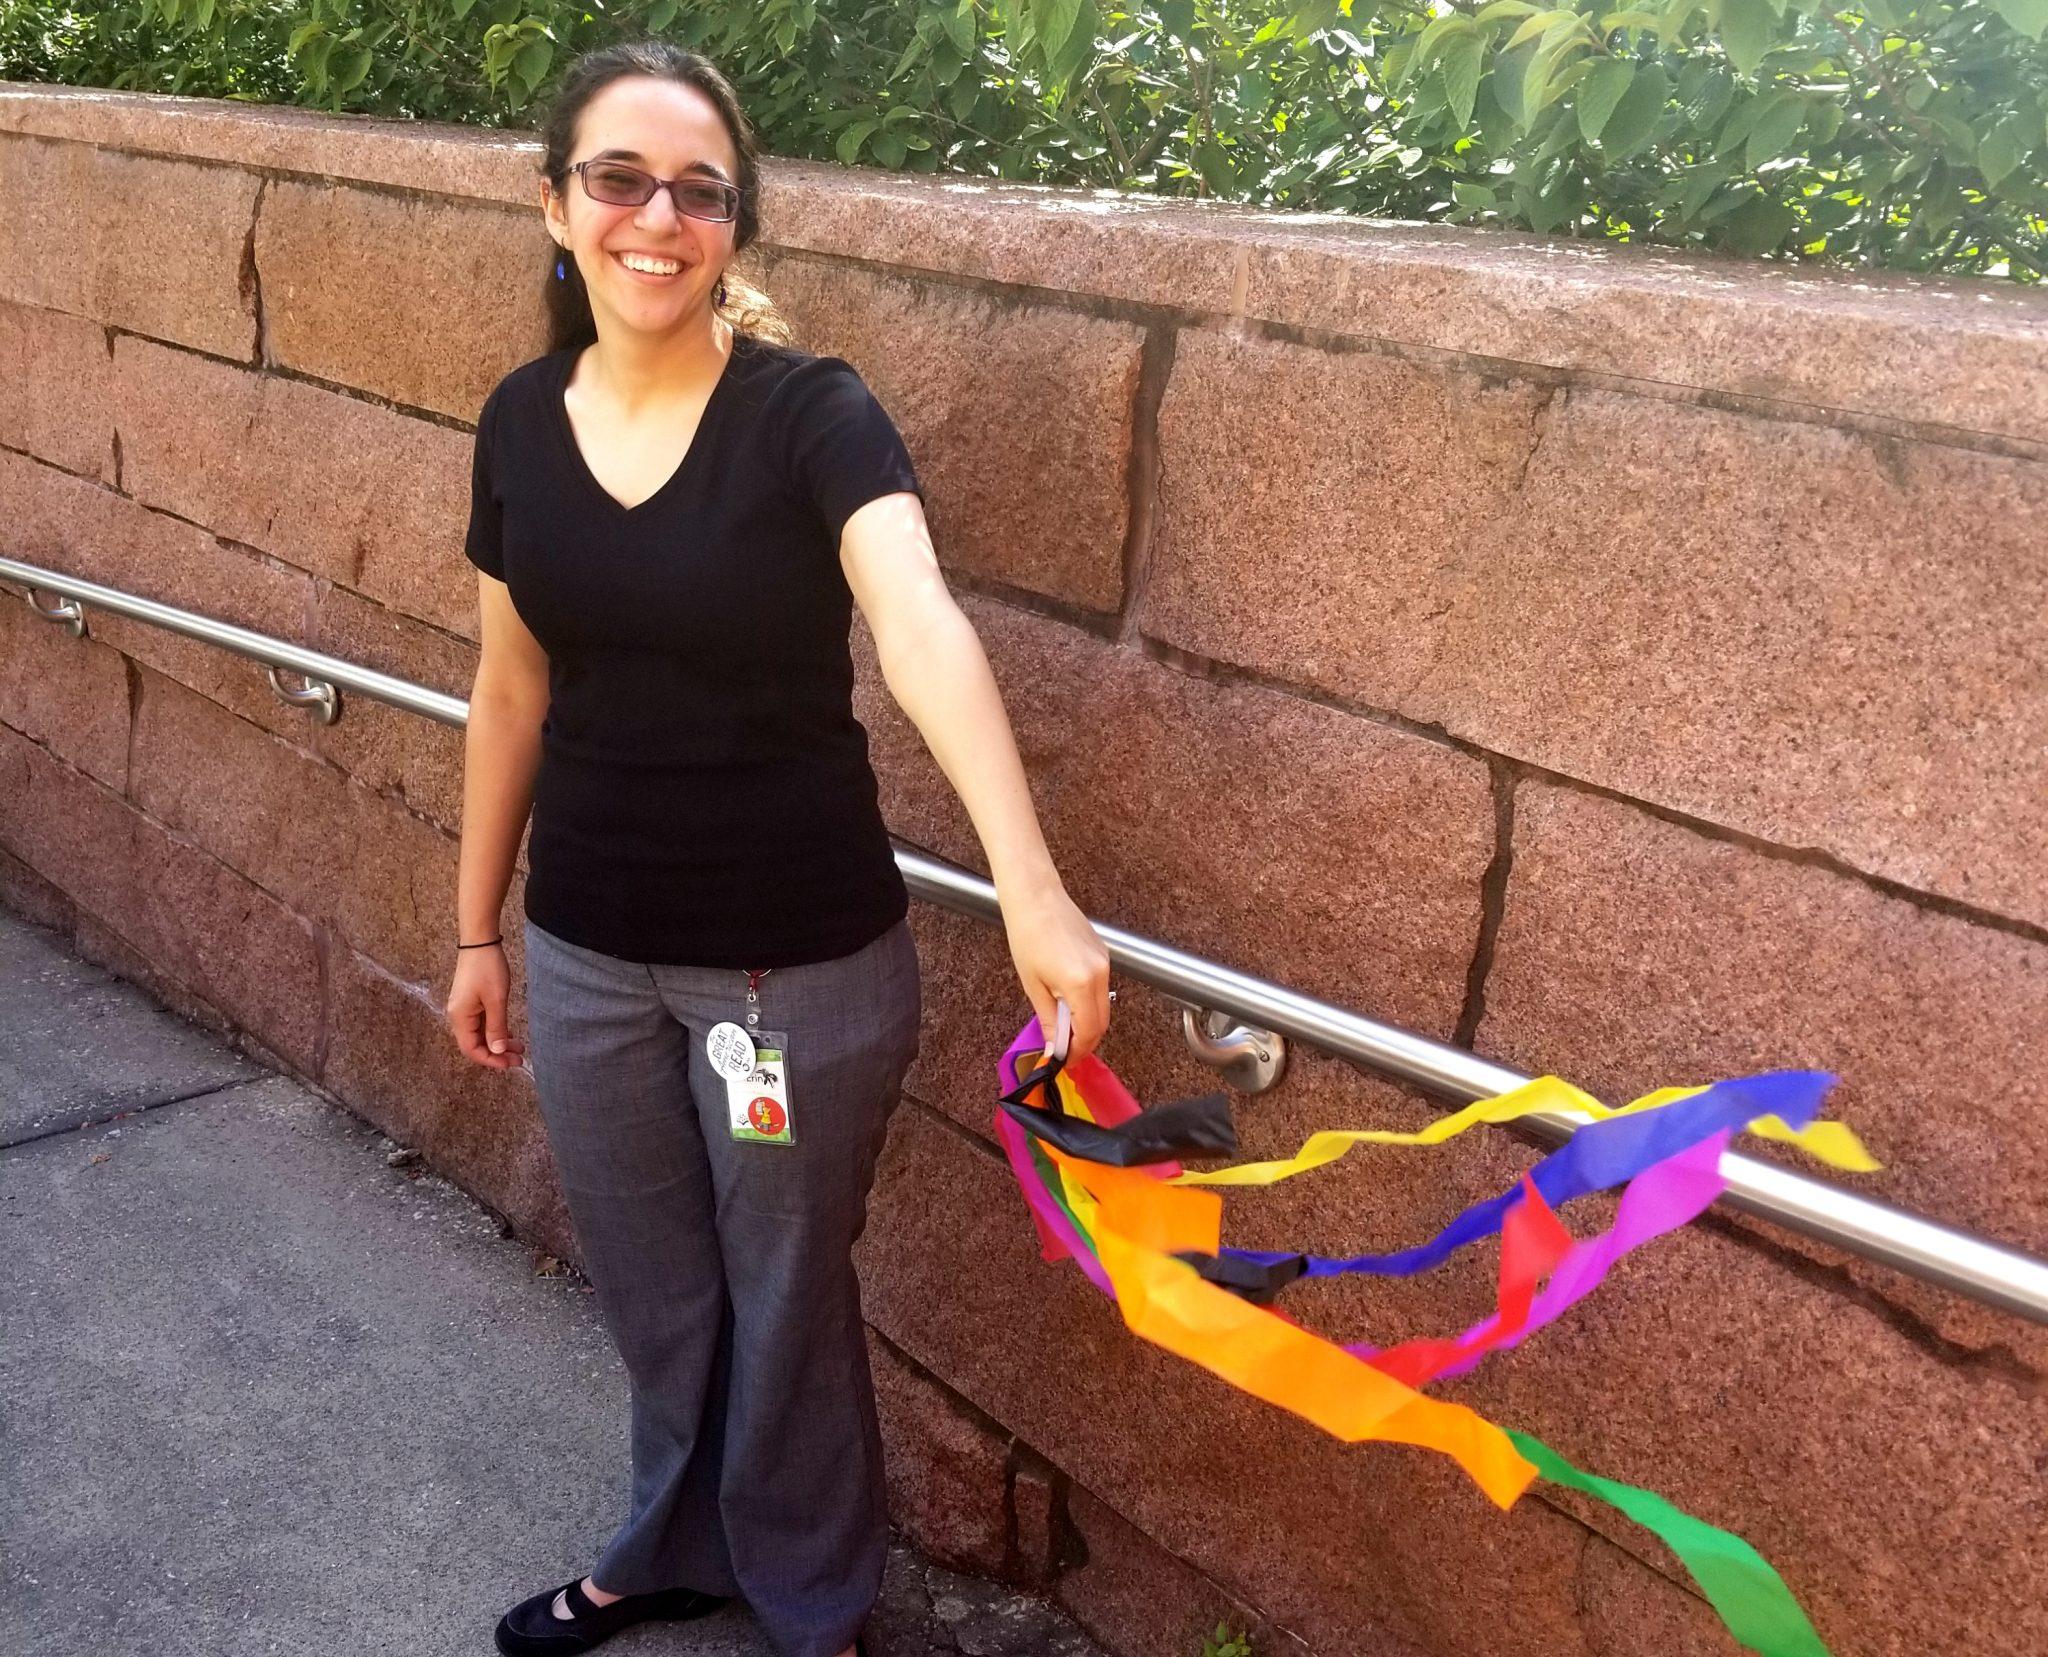 Employee holding DIY rainbow streamer